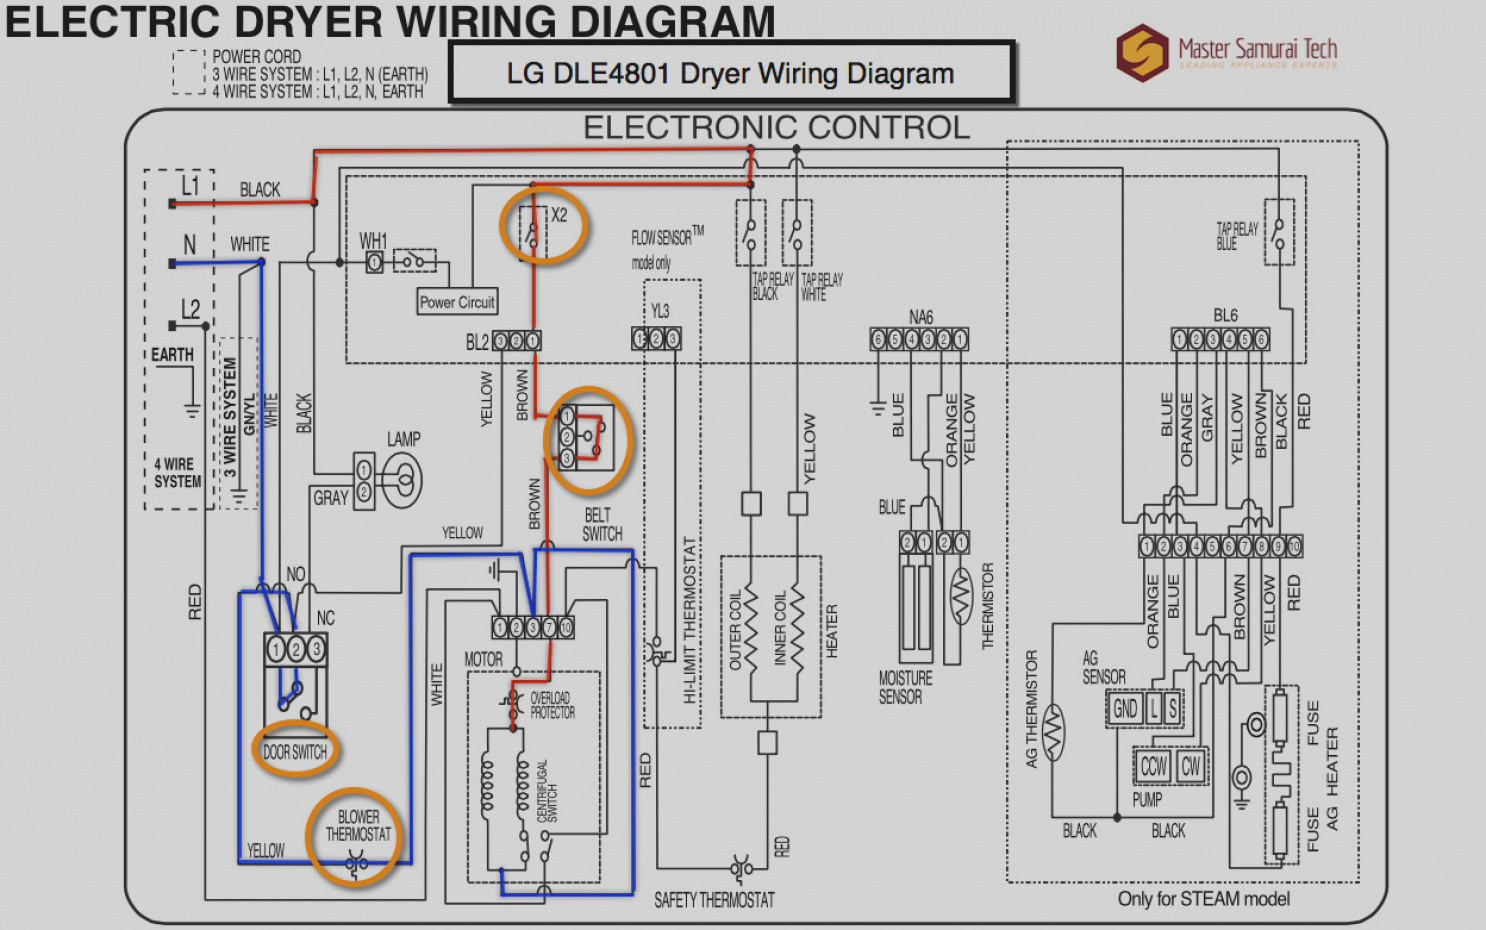 wiring diagram for electrolux dryer frigidaire dryer door  whirlpool lgb6200k dryer wiring diagram #13